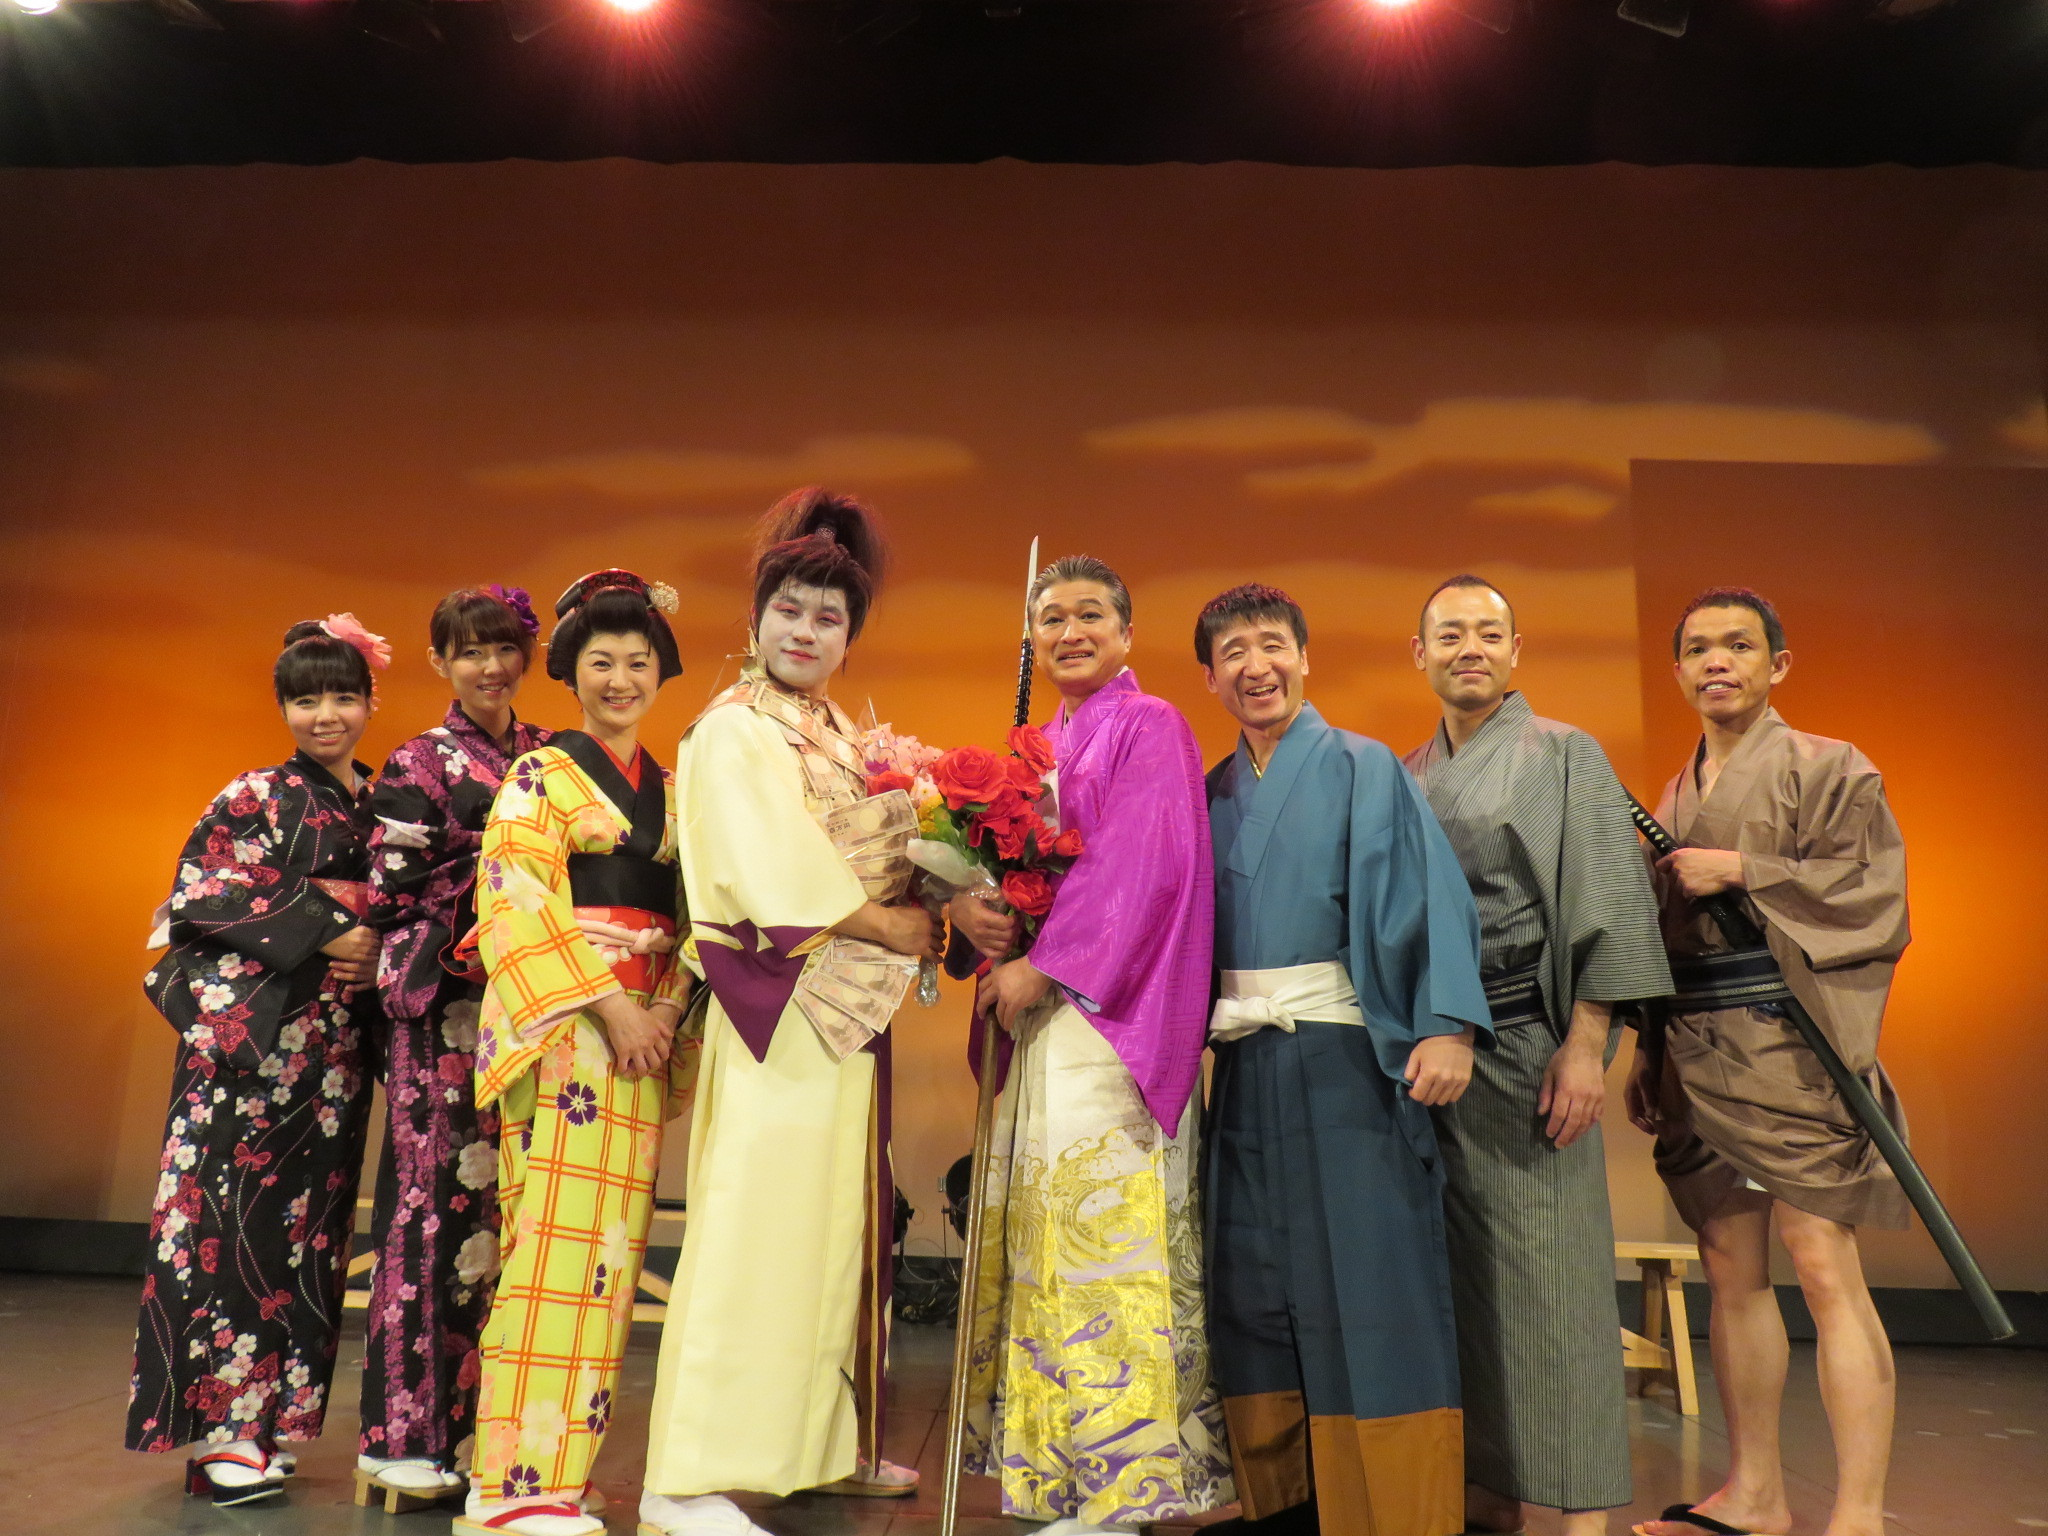 http://news.yoshimoto.co.jp/photos/uncategorized/2015/05/31/20150531134808-fbea1d84d10ececef58a298ebbaaeed30531616c.jpg